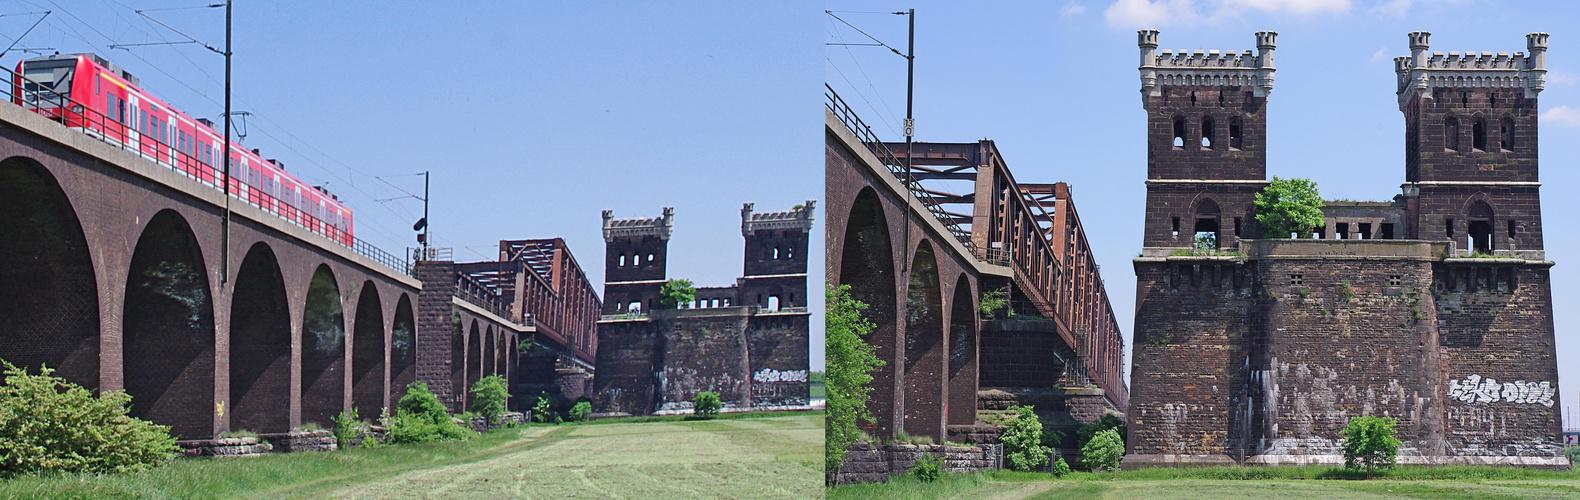 Rheinhauser Brücke